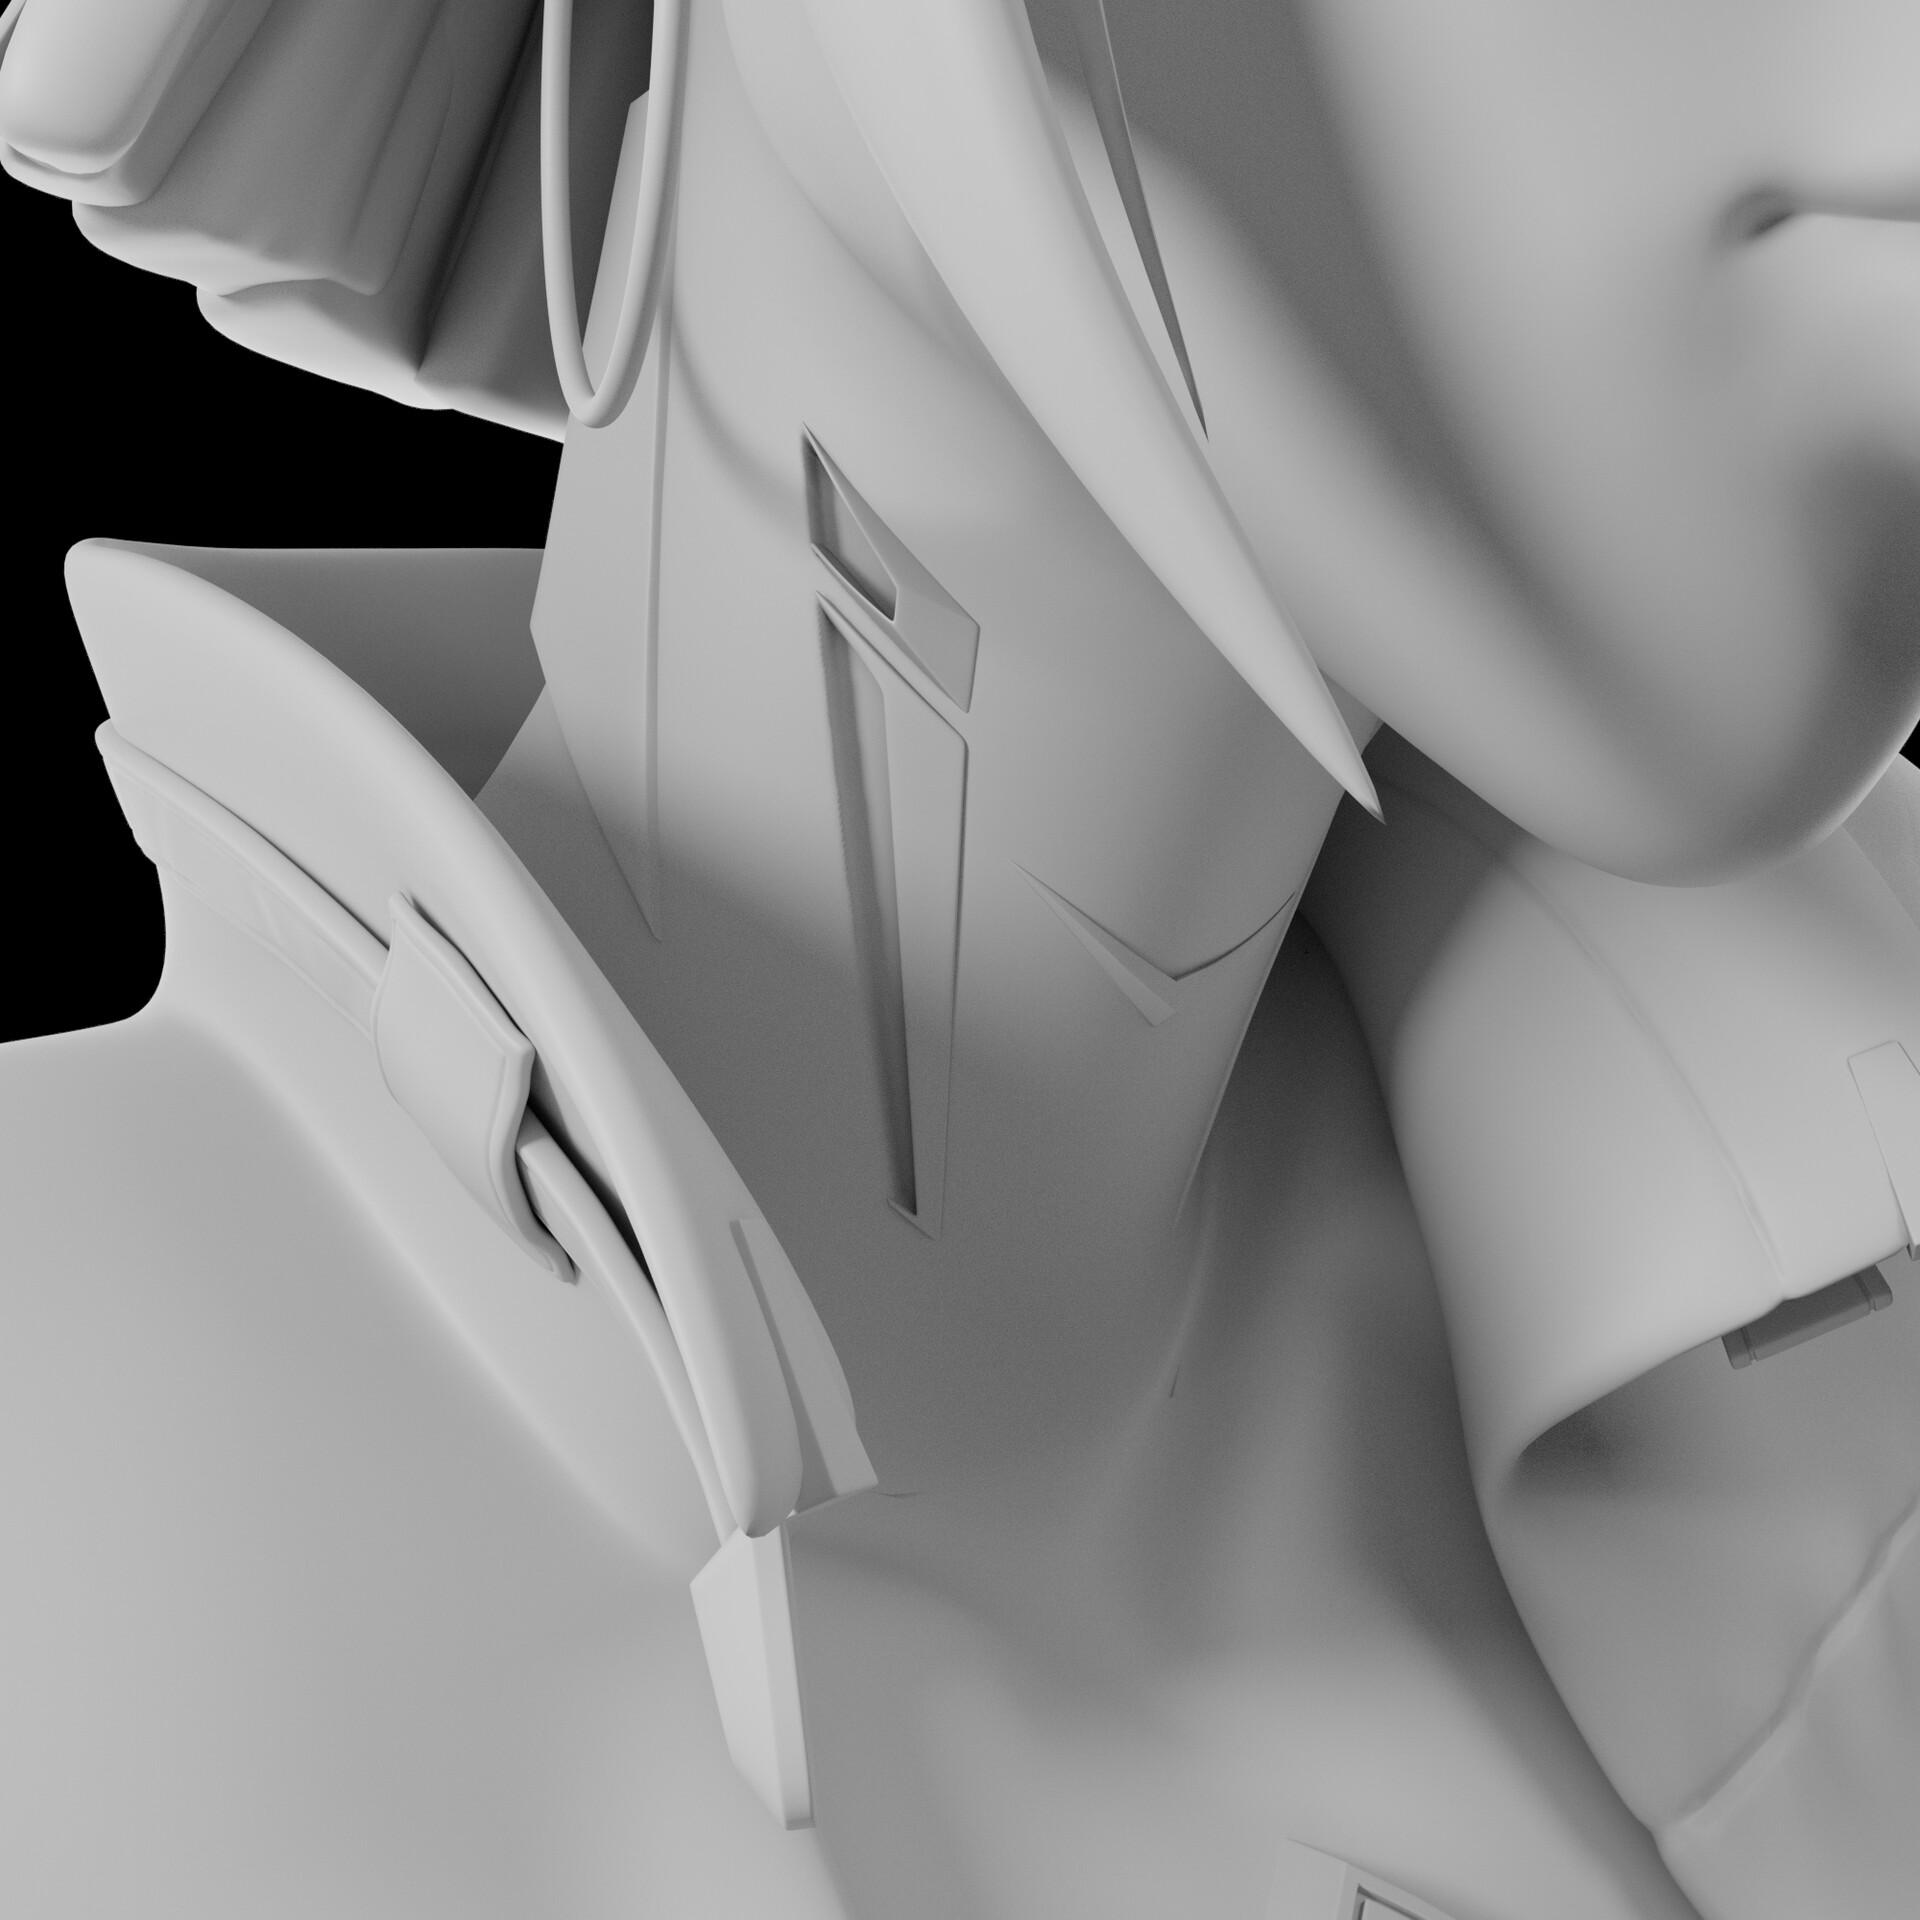 Sergi camprubi detail clay render 03